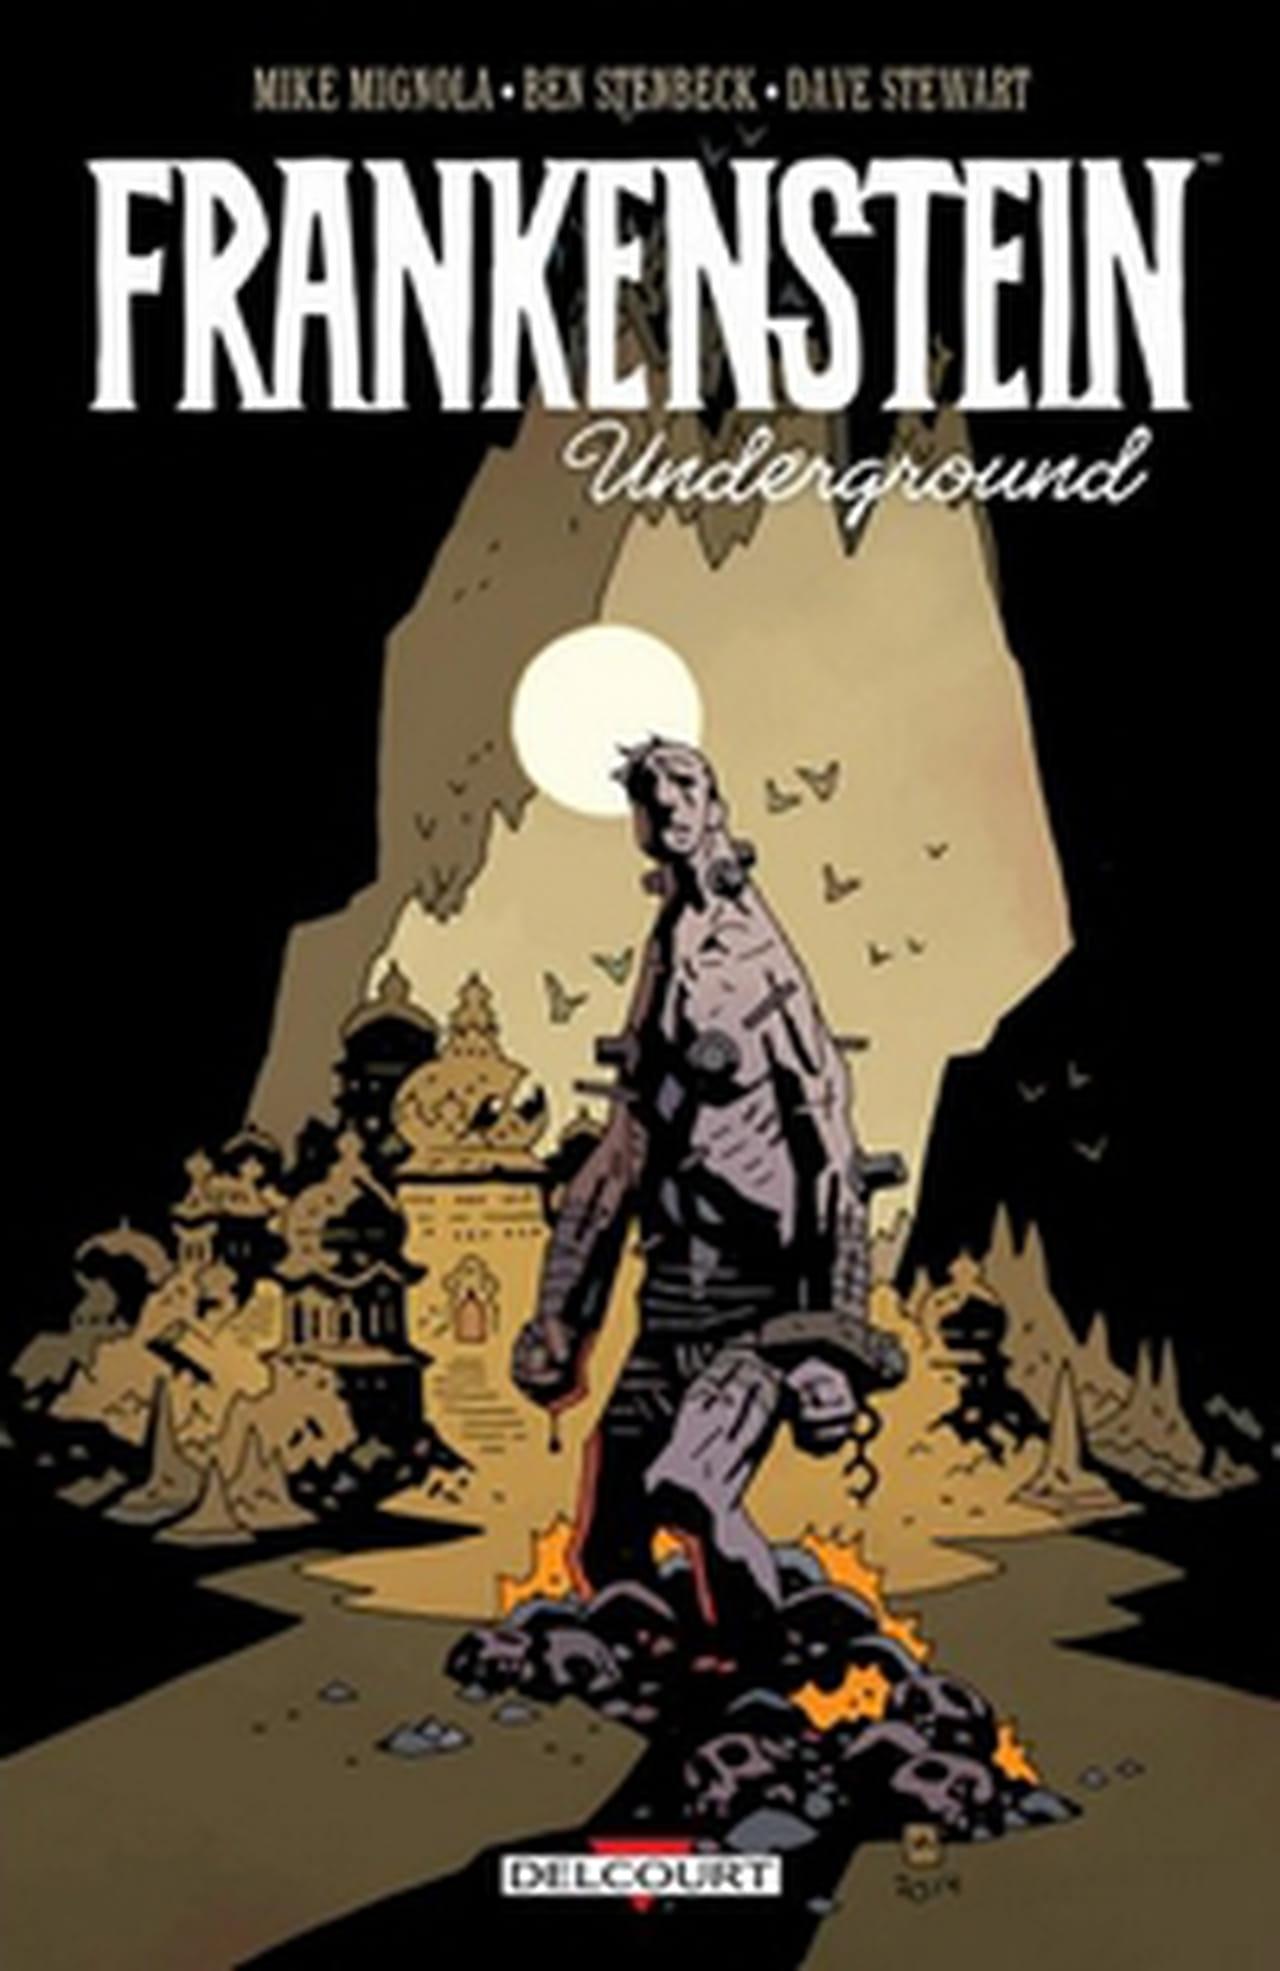 la cr u00e9ature de frankenstein dans la terre creuse